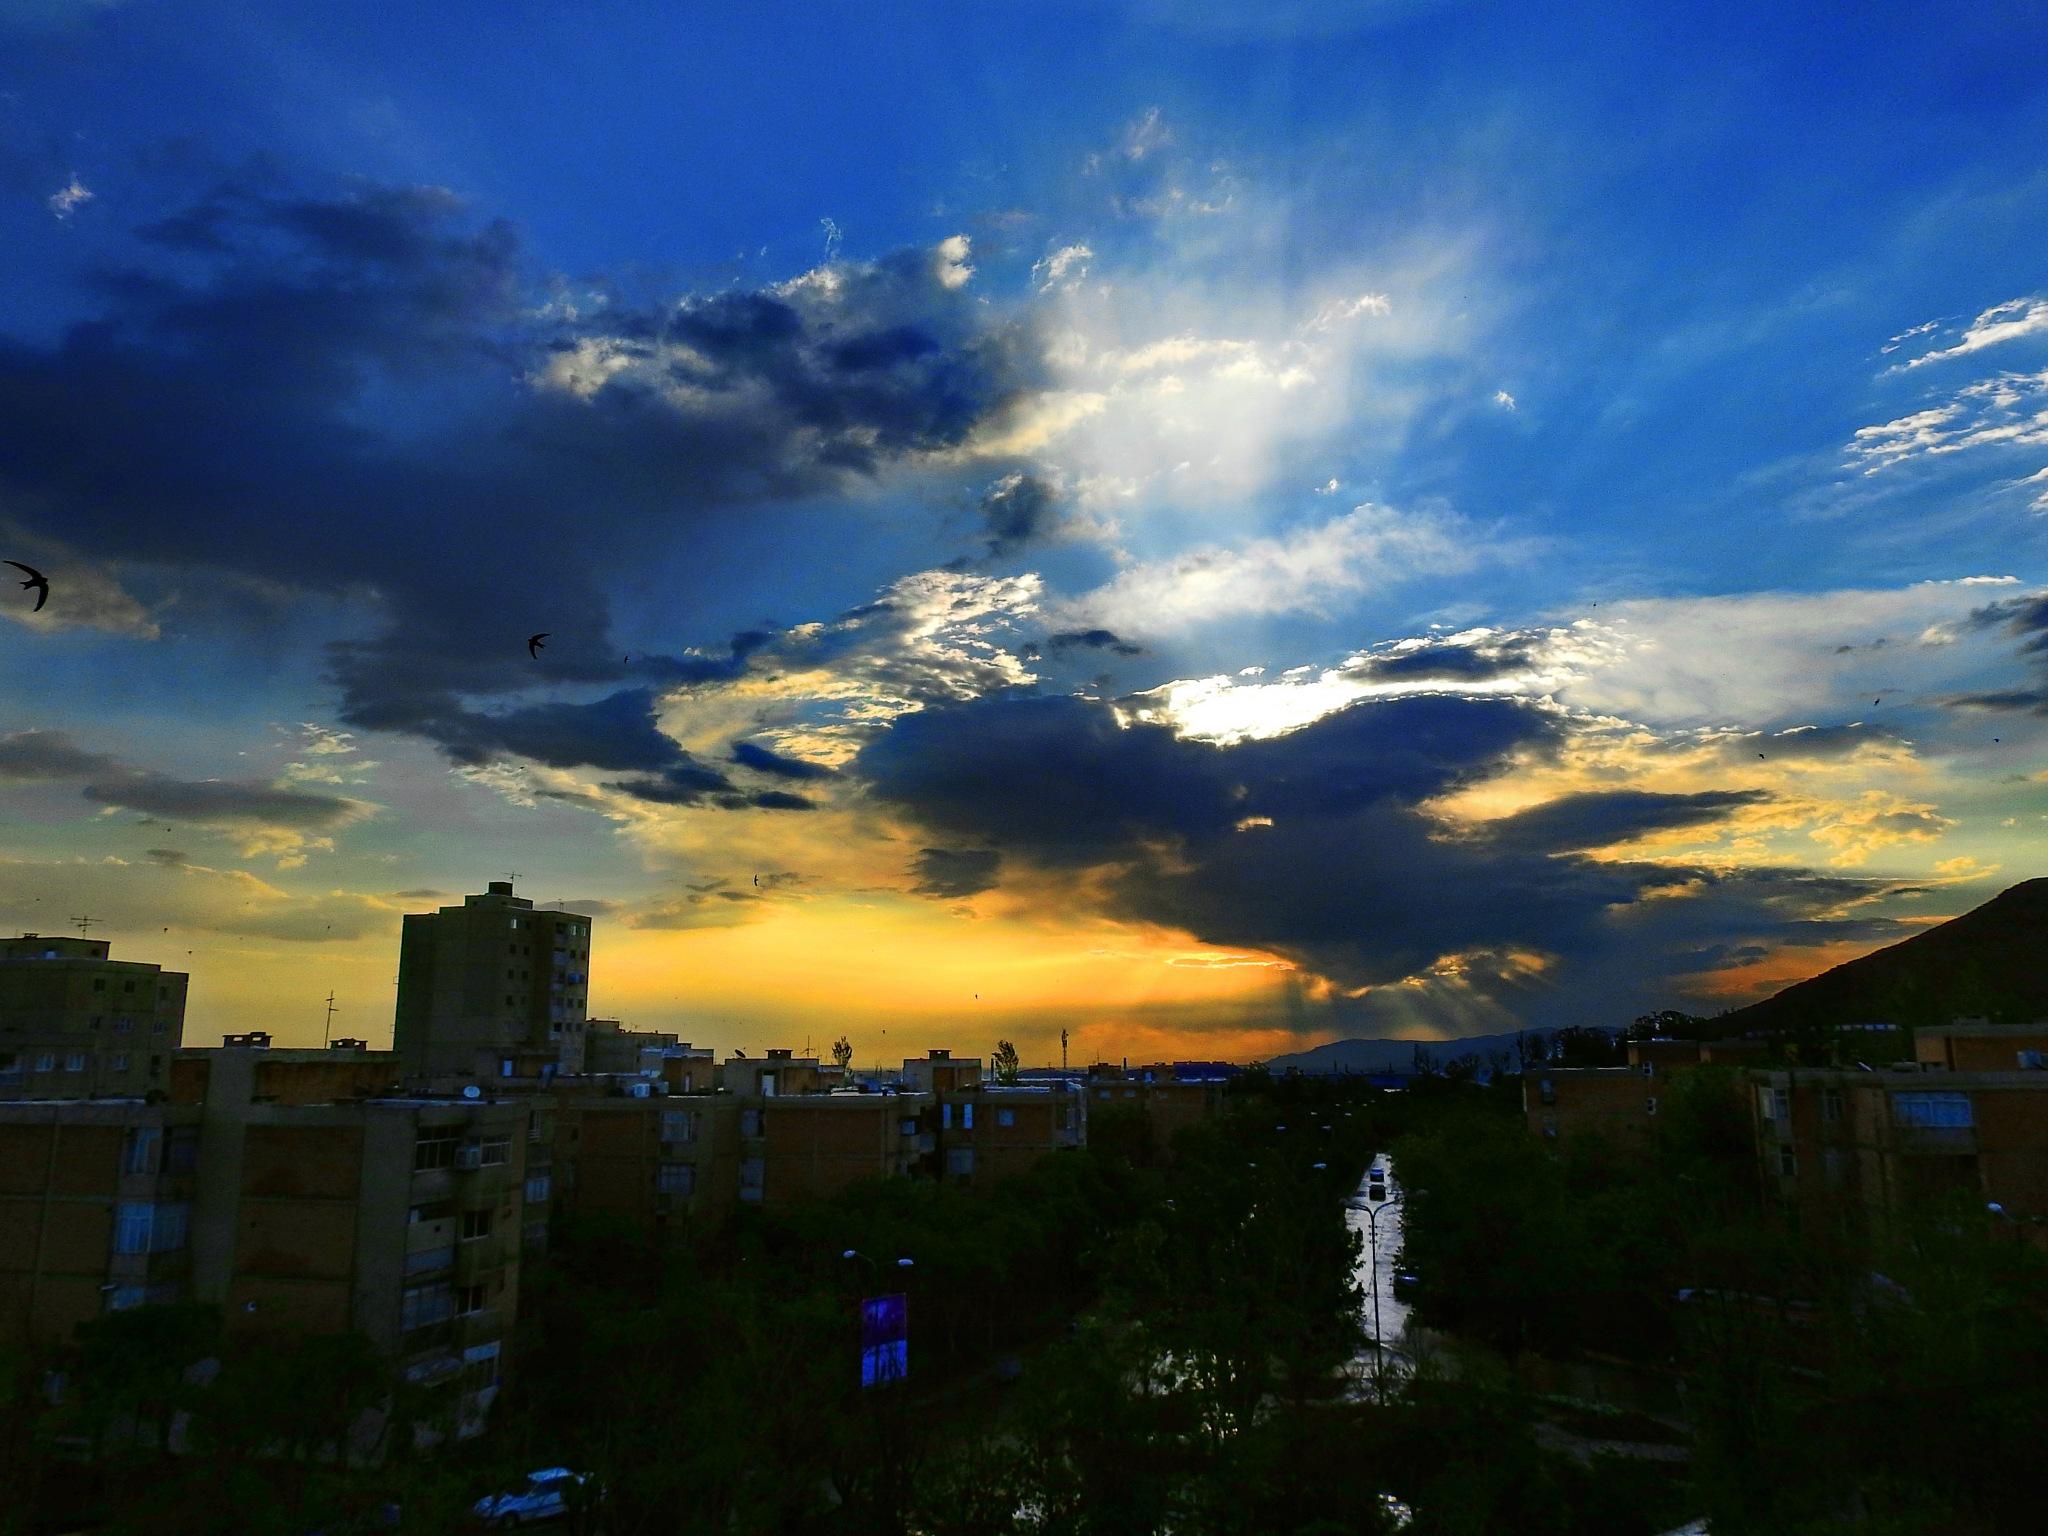 sunrise by Aahmad Hezavei